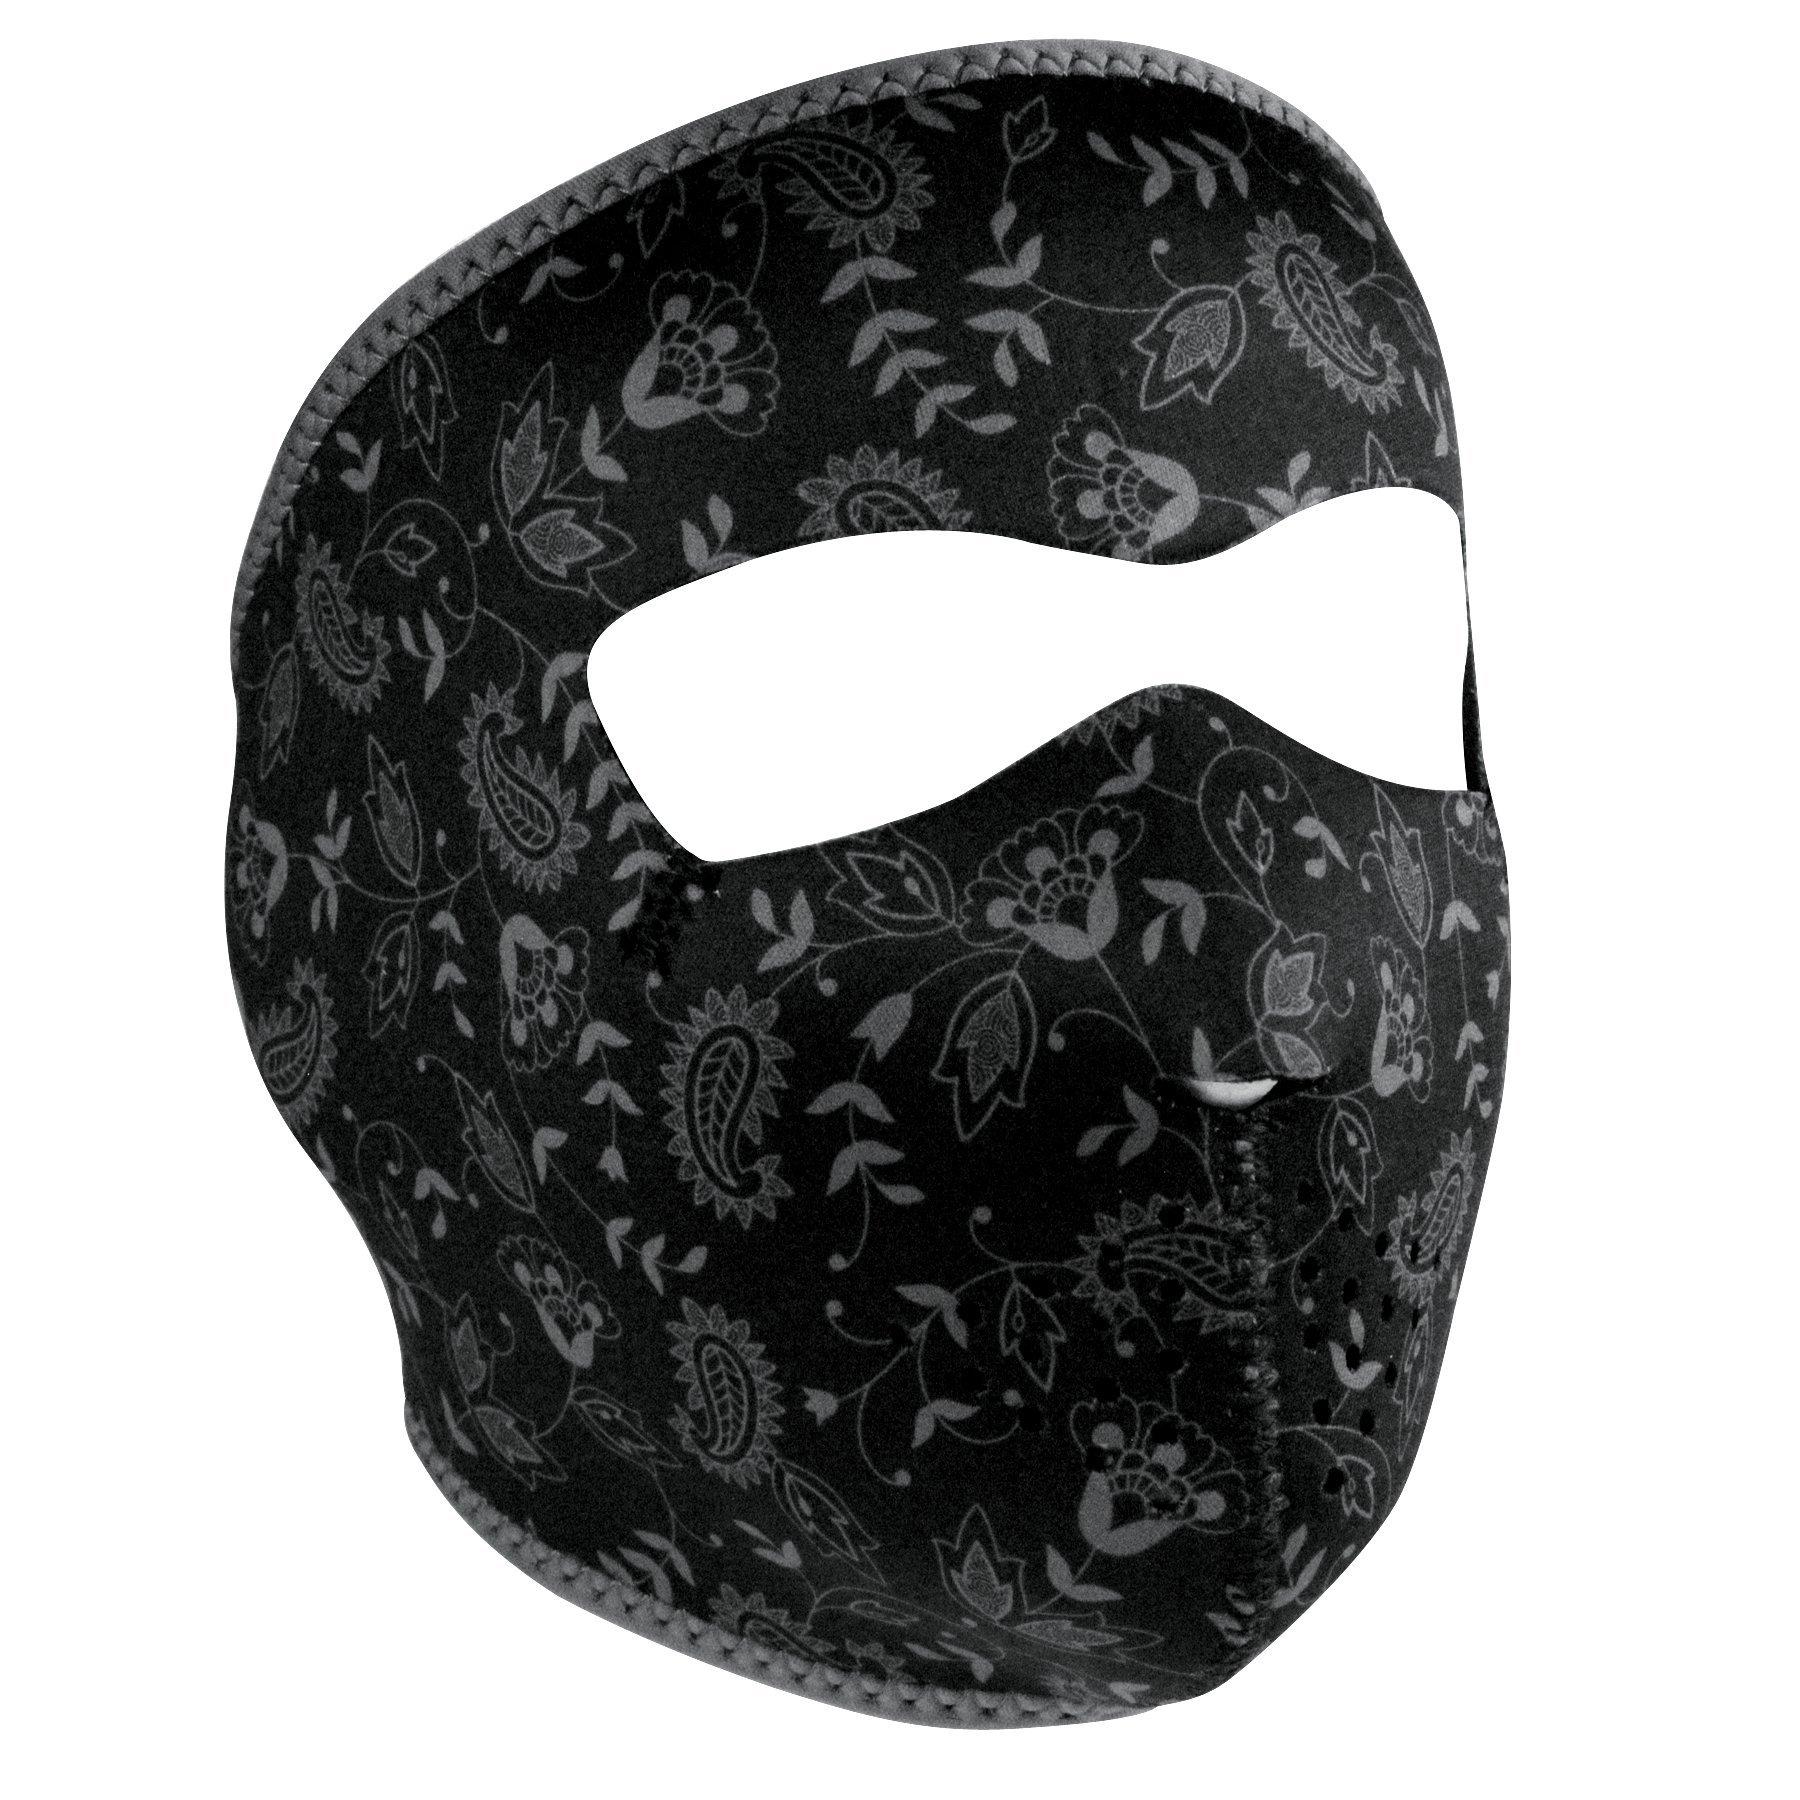 ZANheadgear facemask (Dark Paisley, Adult/Unisex) by Zanheadgear